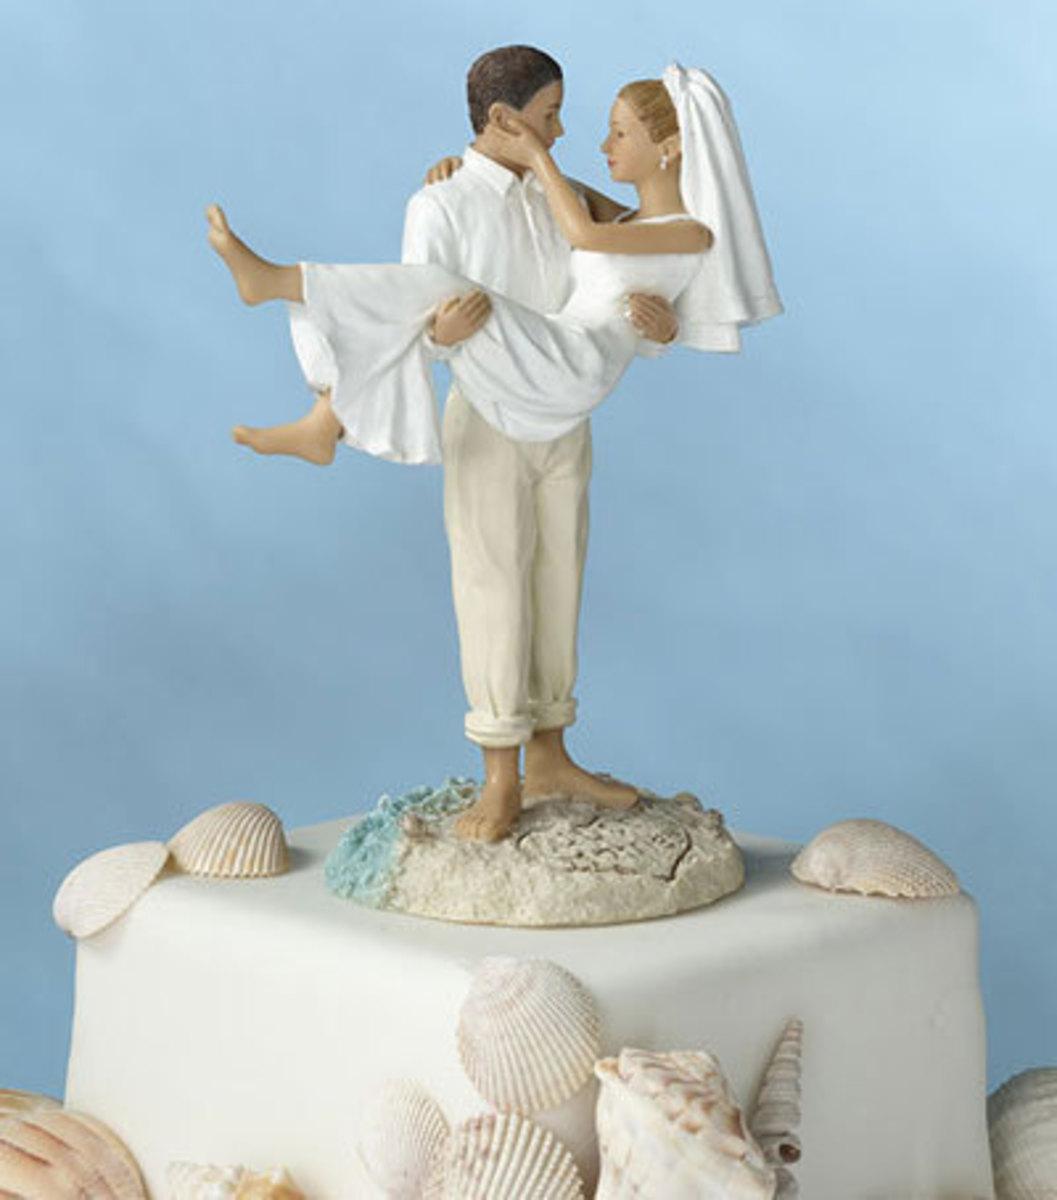 Just Married Beach Wedding Cake Topper